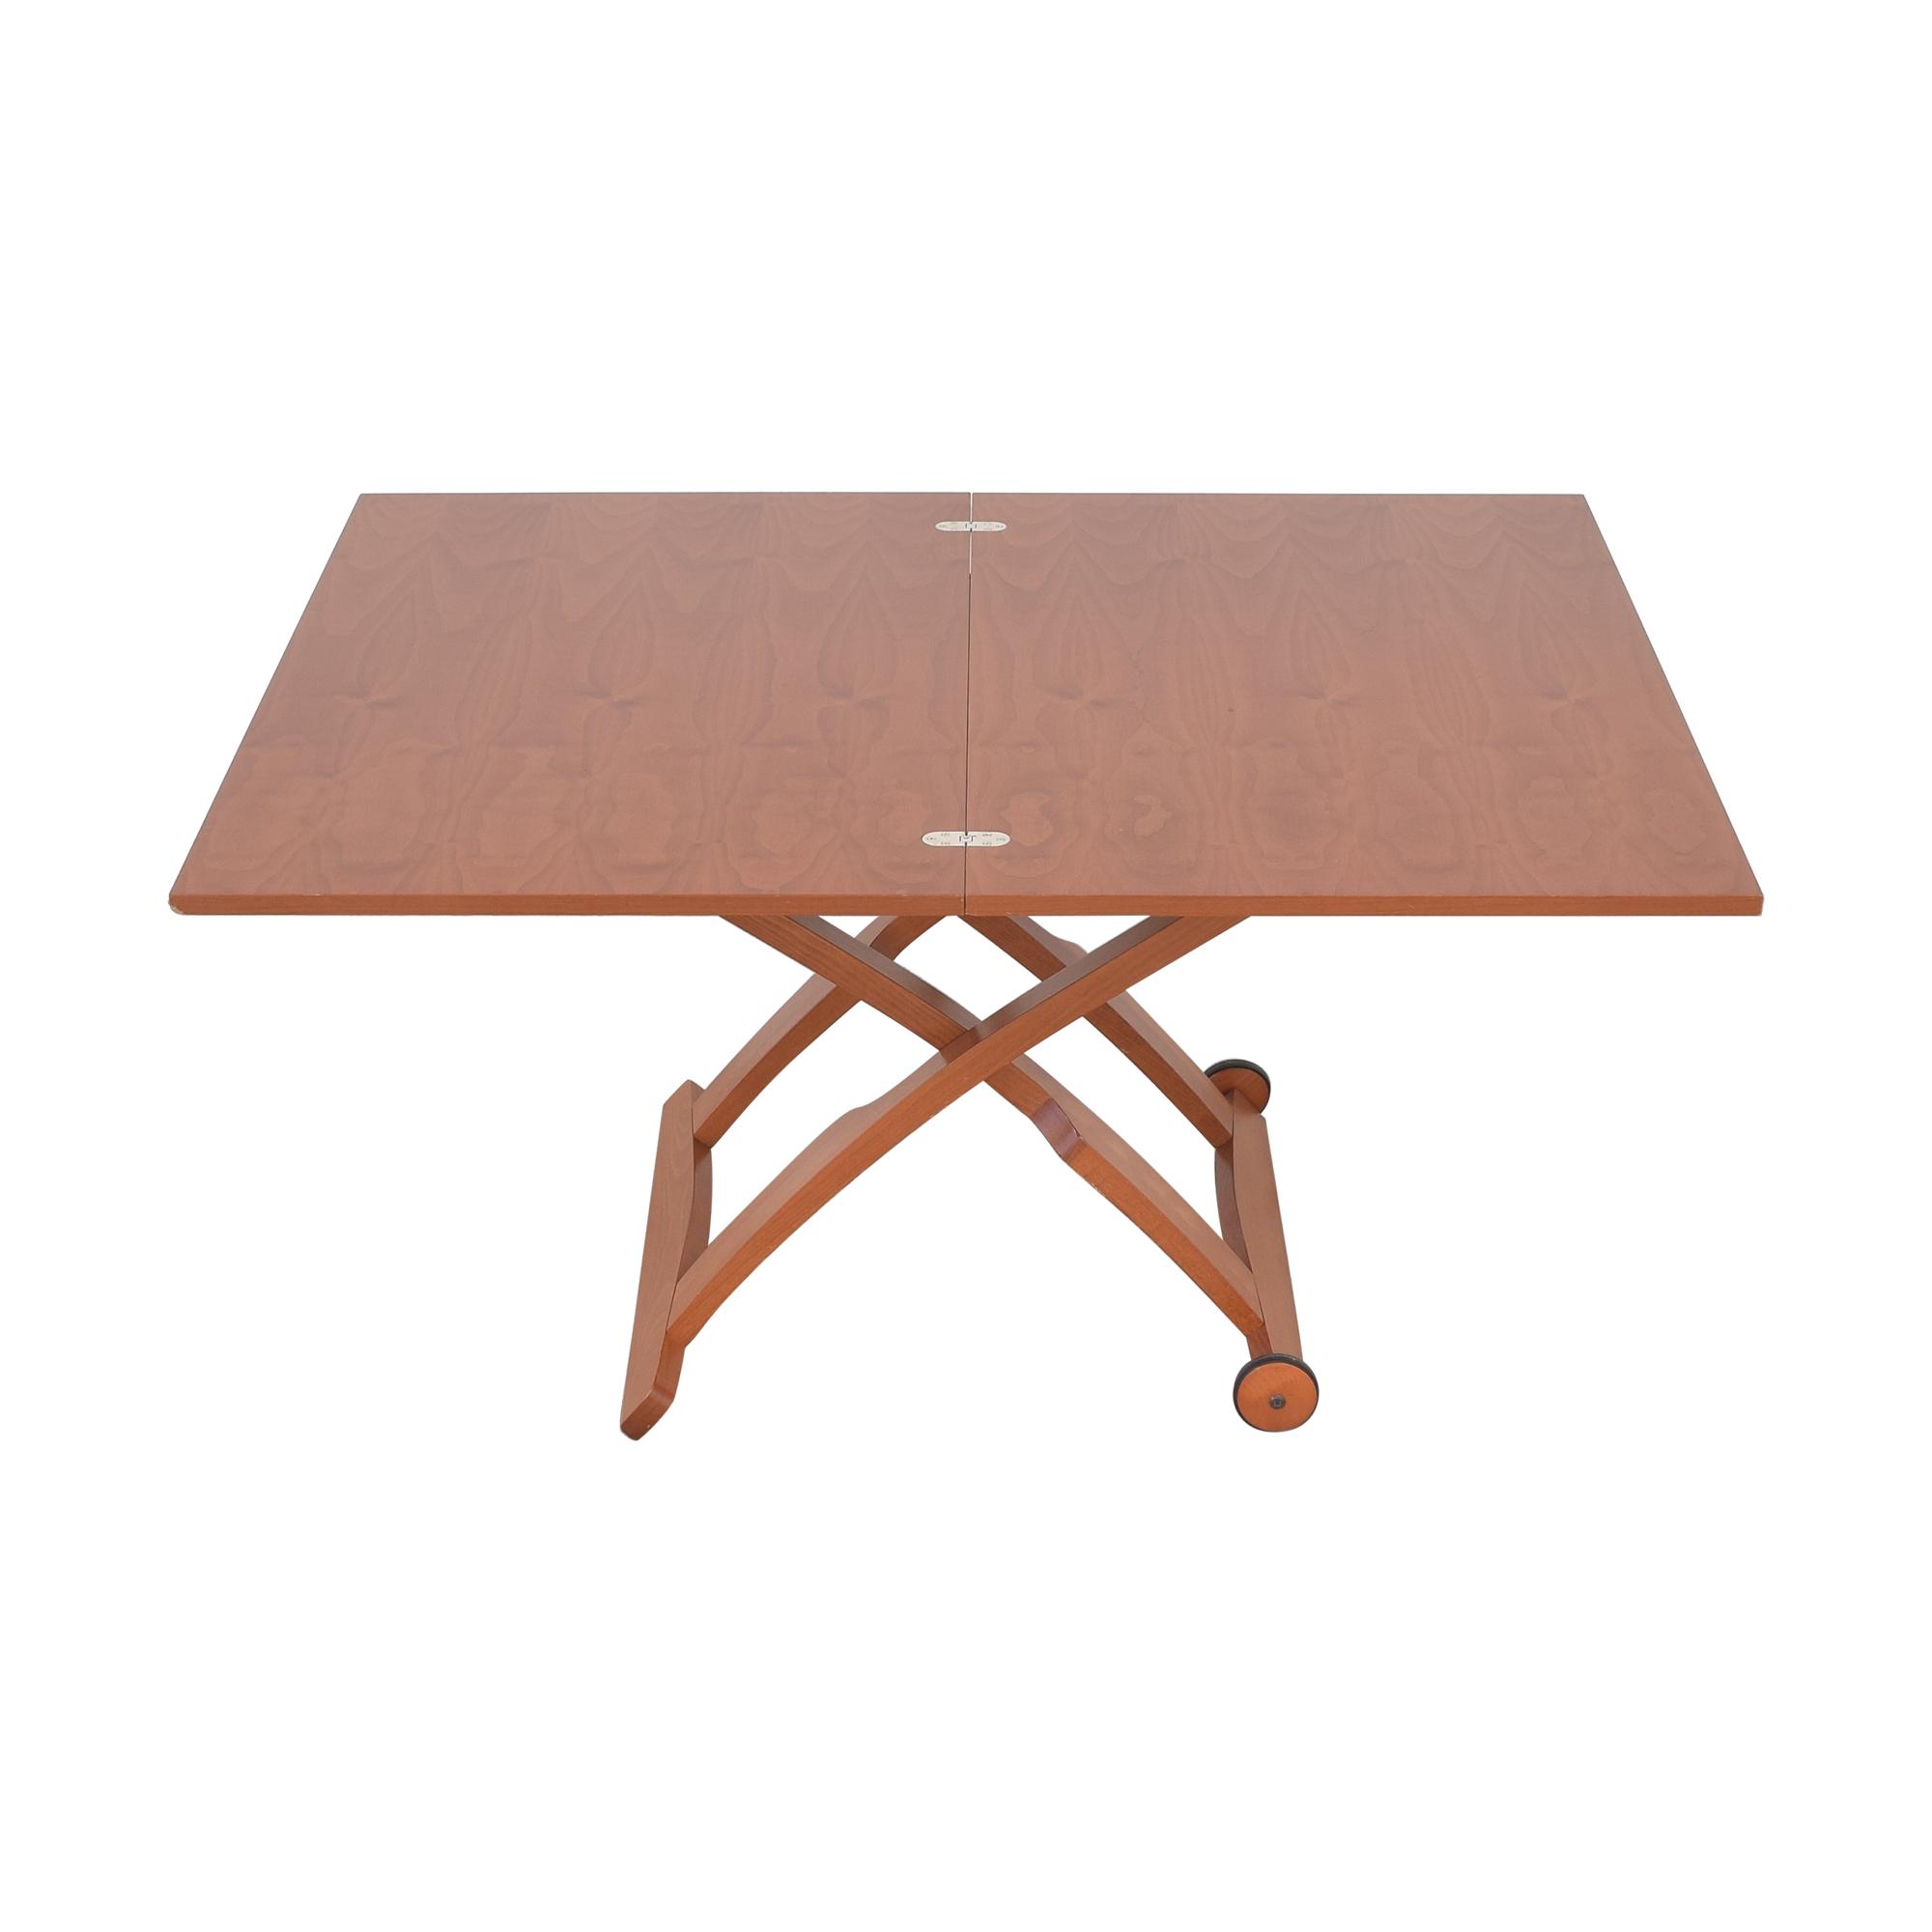 Calligaris Connubia Multipurpose Extension Table / Tables